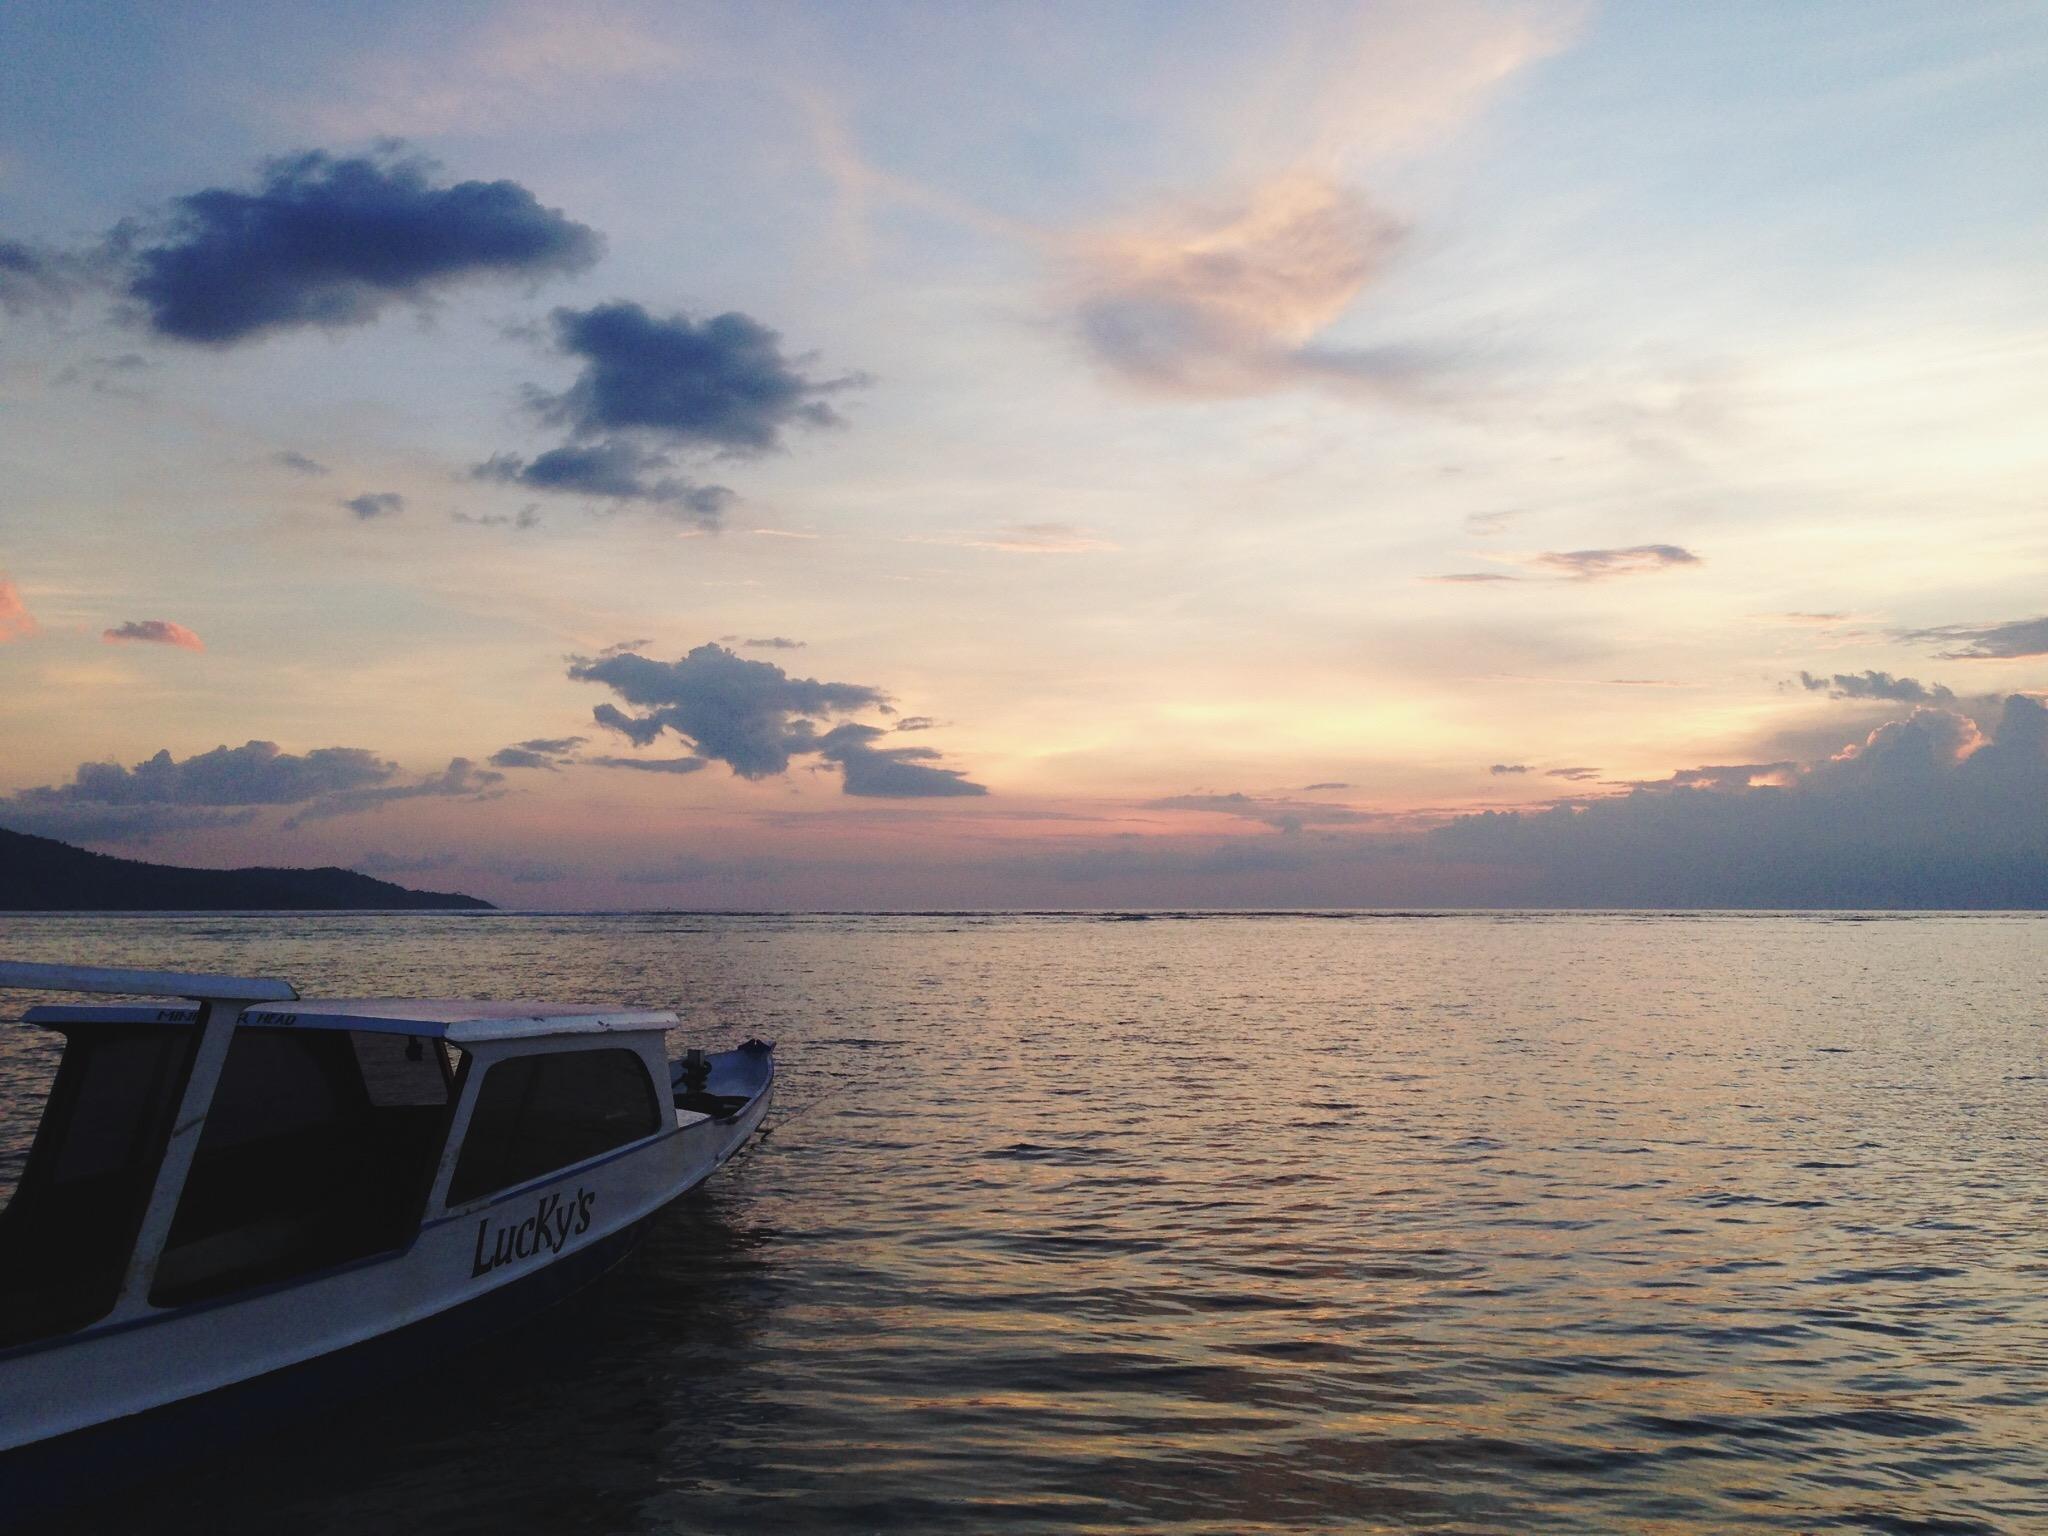 sunset-at-gili-air.jpg